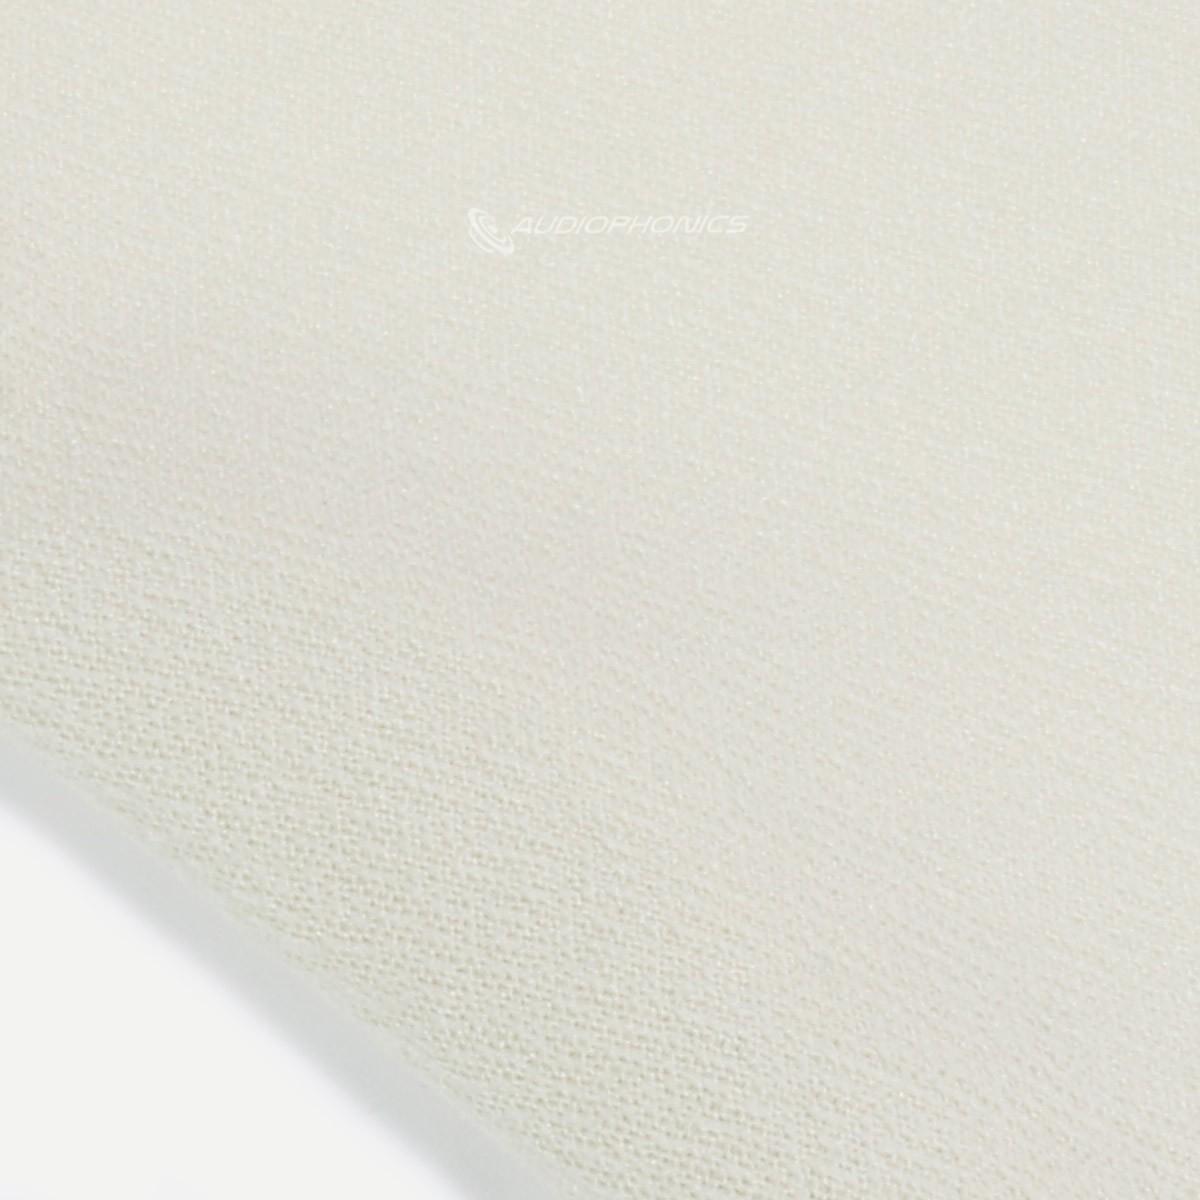 Acoustic Speaker Fabric 150x75cm Ecru